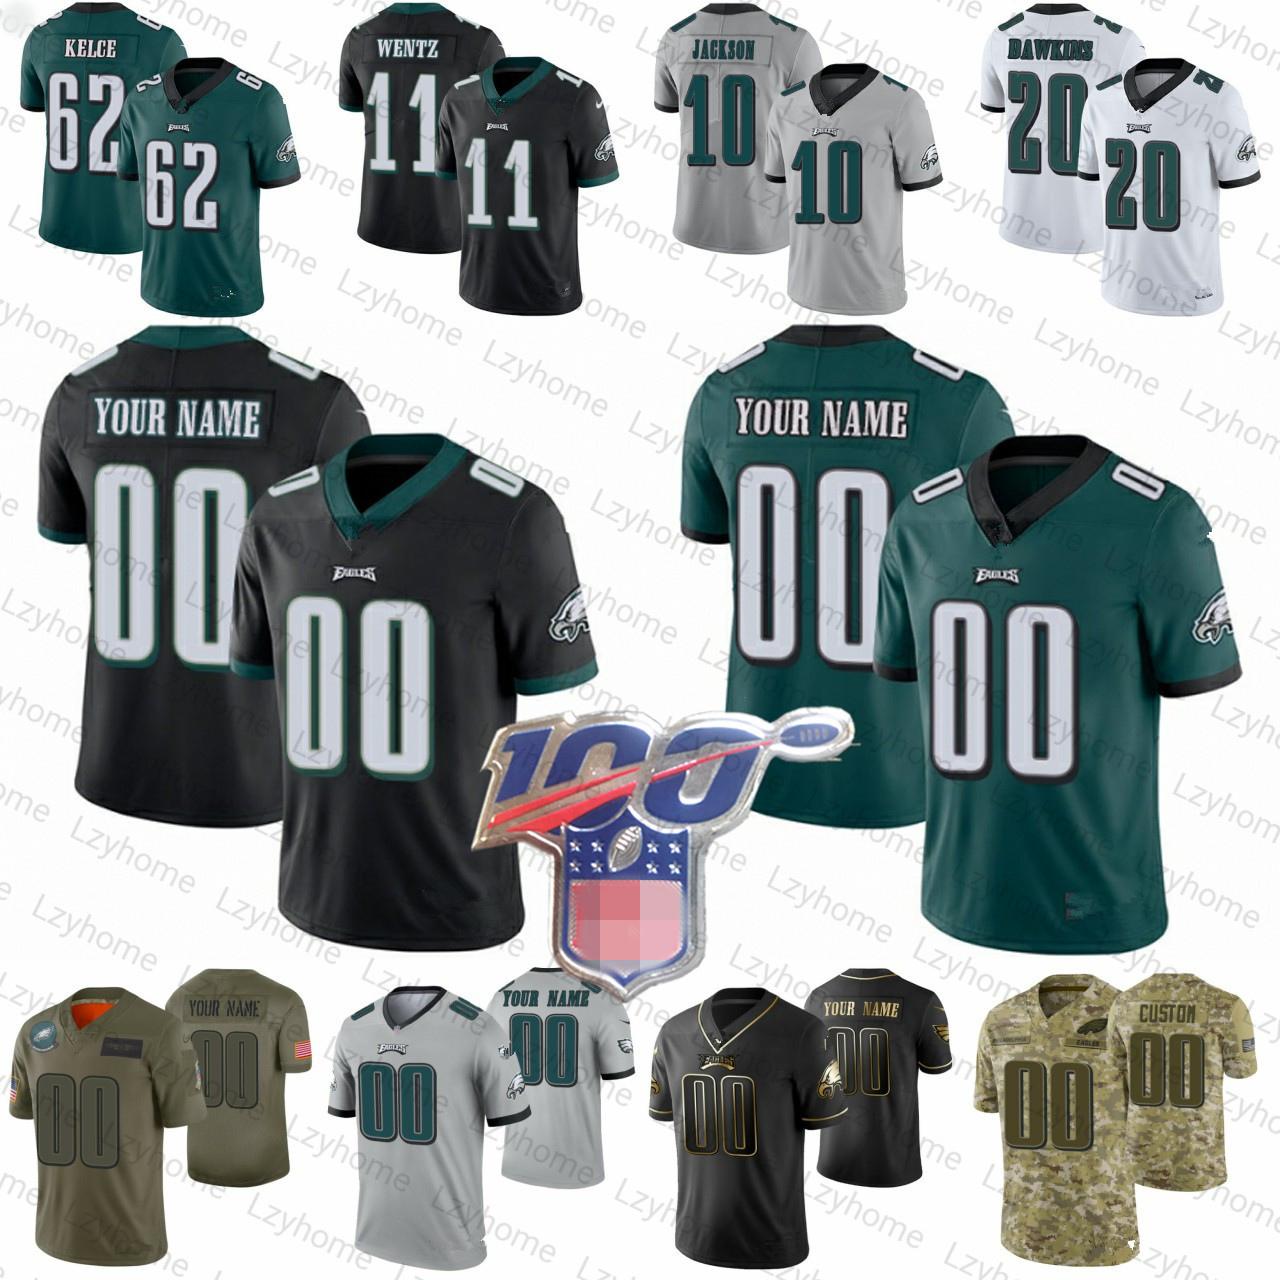 where to buy eagles jerseys near me